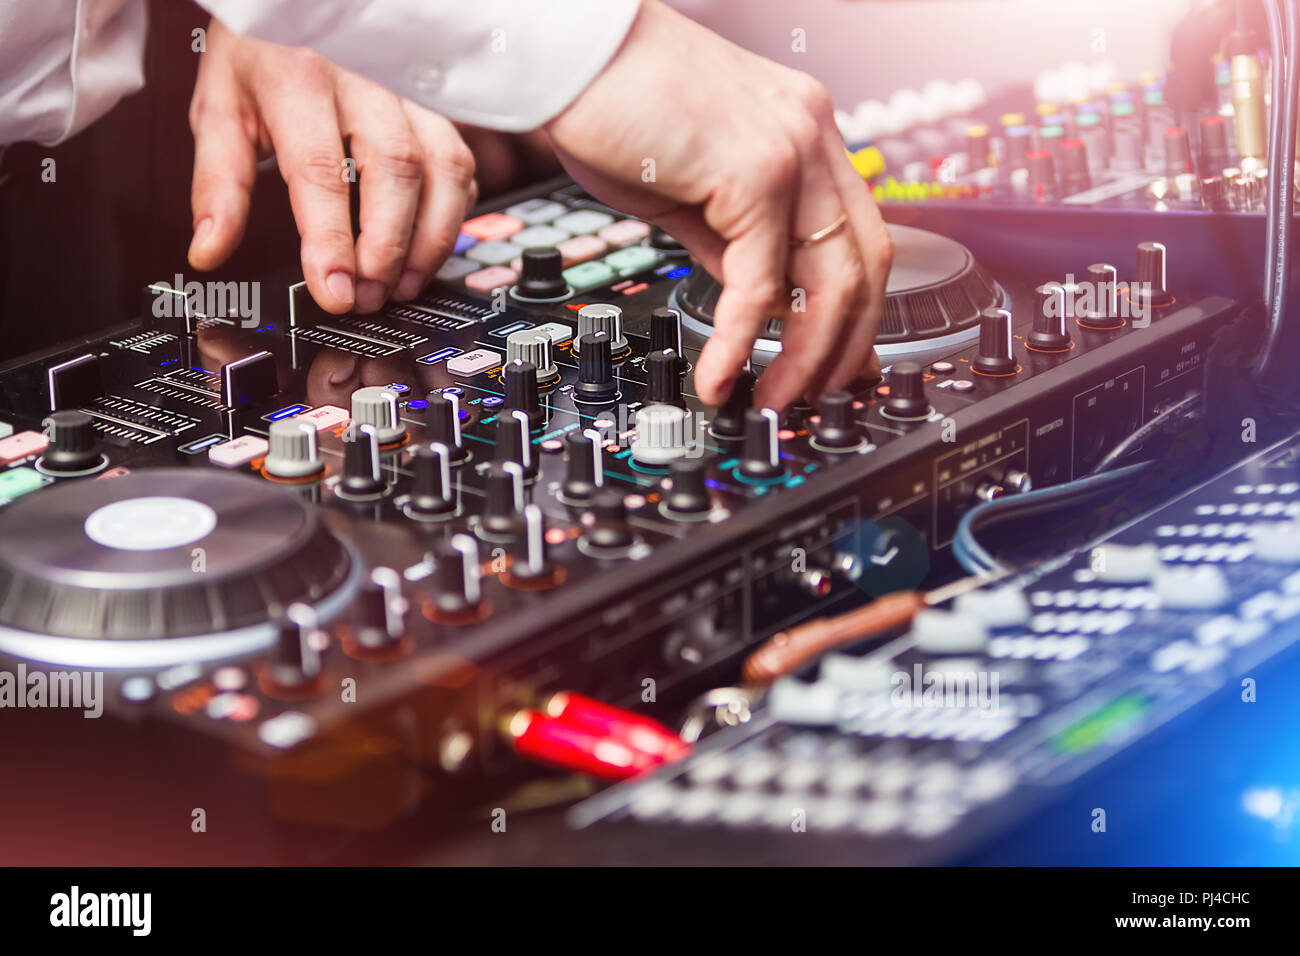 DJ playing music at control panel - Stock Image